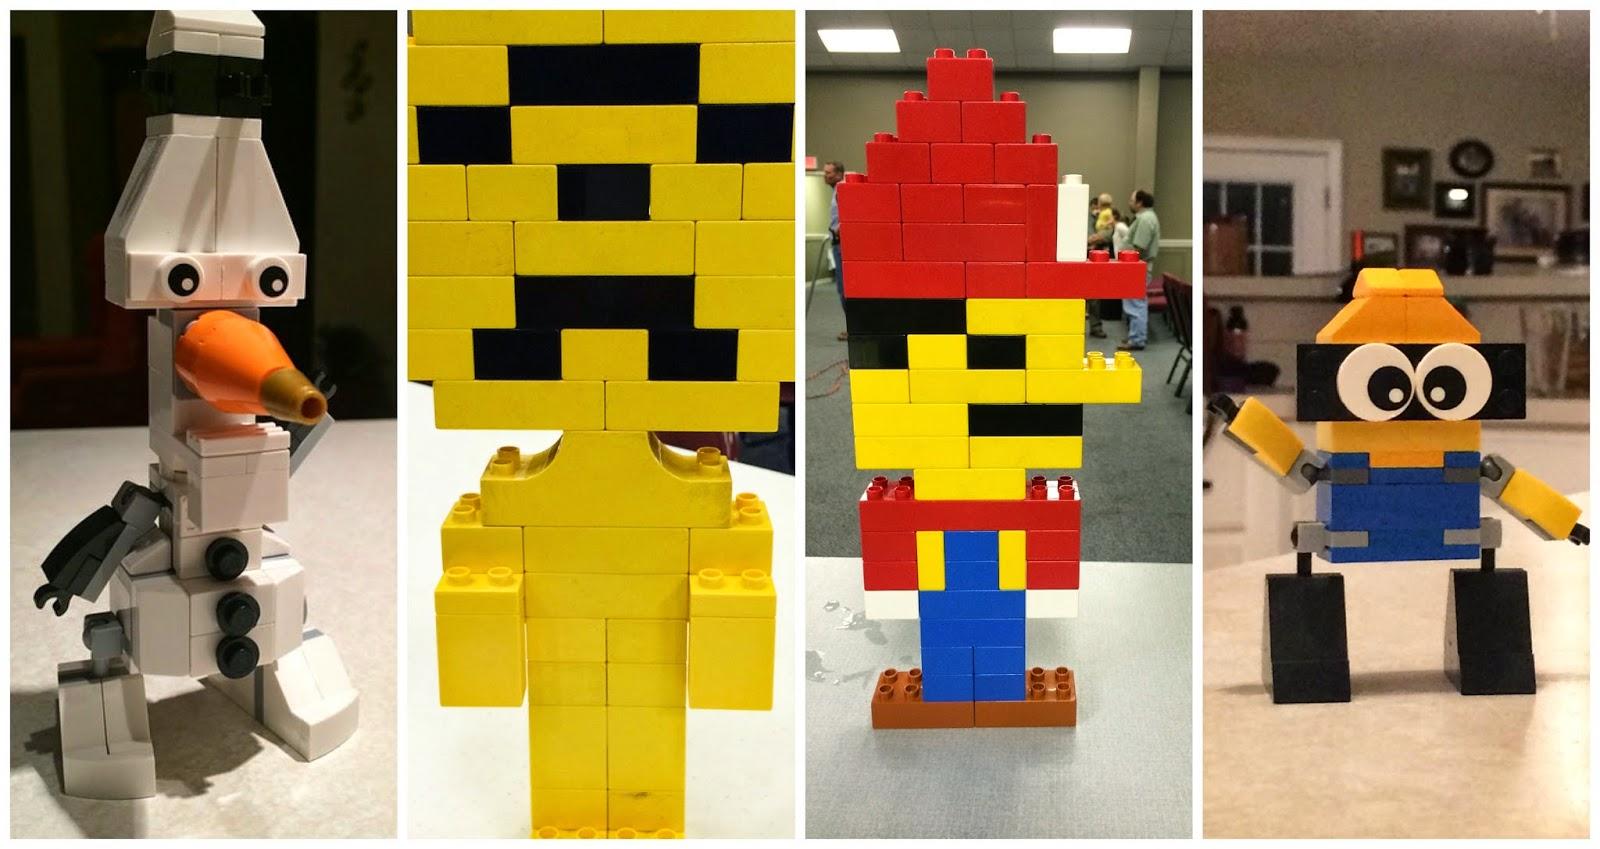 Sam's_World_Autism_Lego_Creations_Olaf_Grumpy_Cat_Mario_Minions